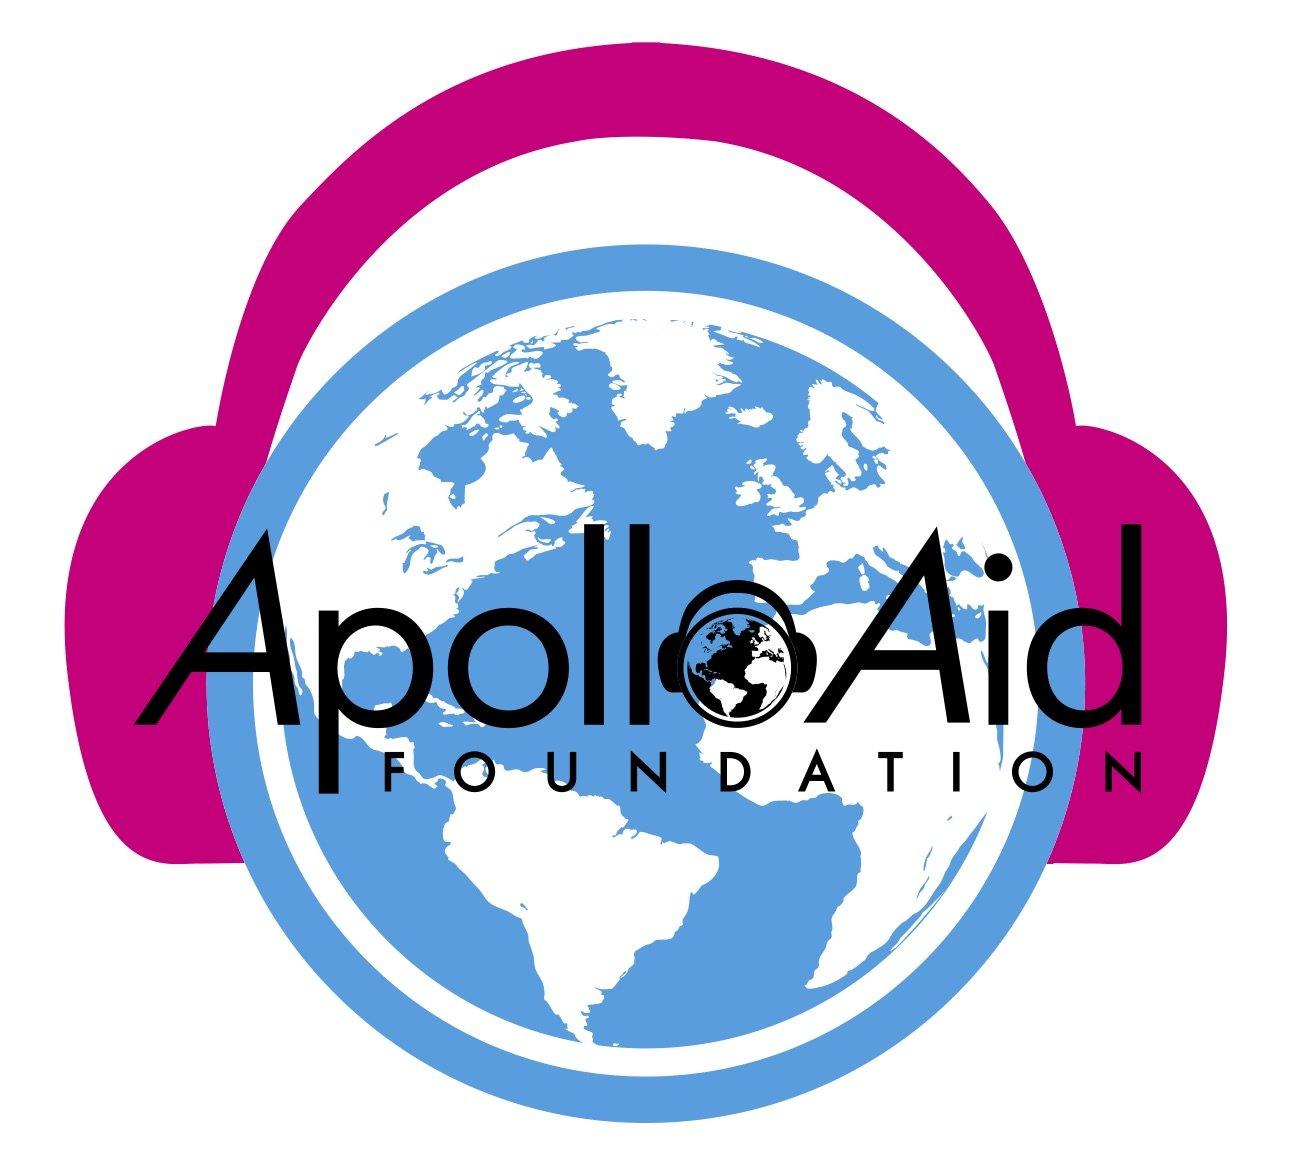 The Apollo Aid Foundation